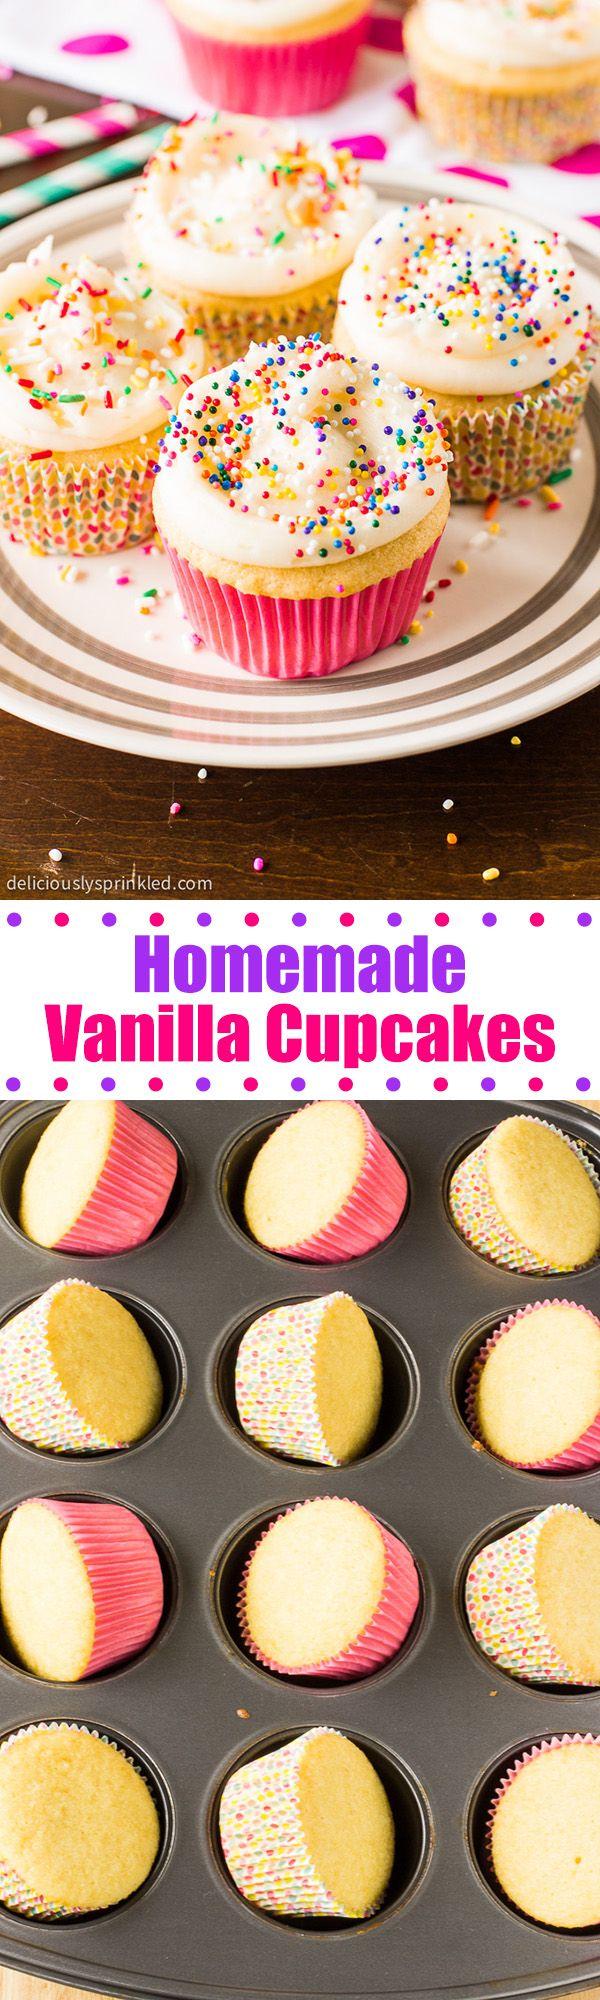 easy homemade vanilla cupcakes